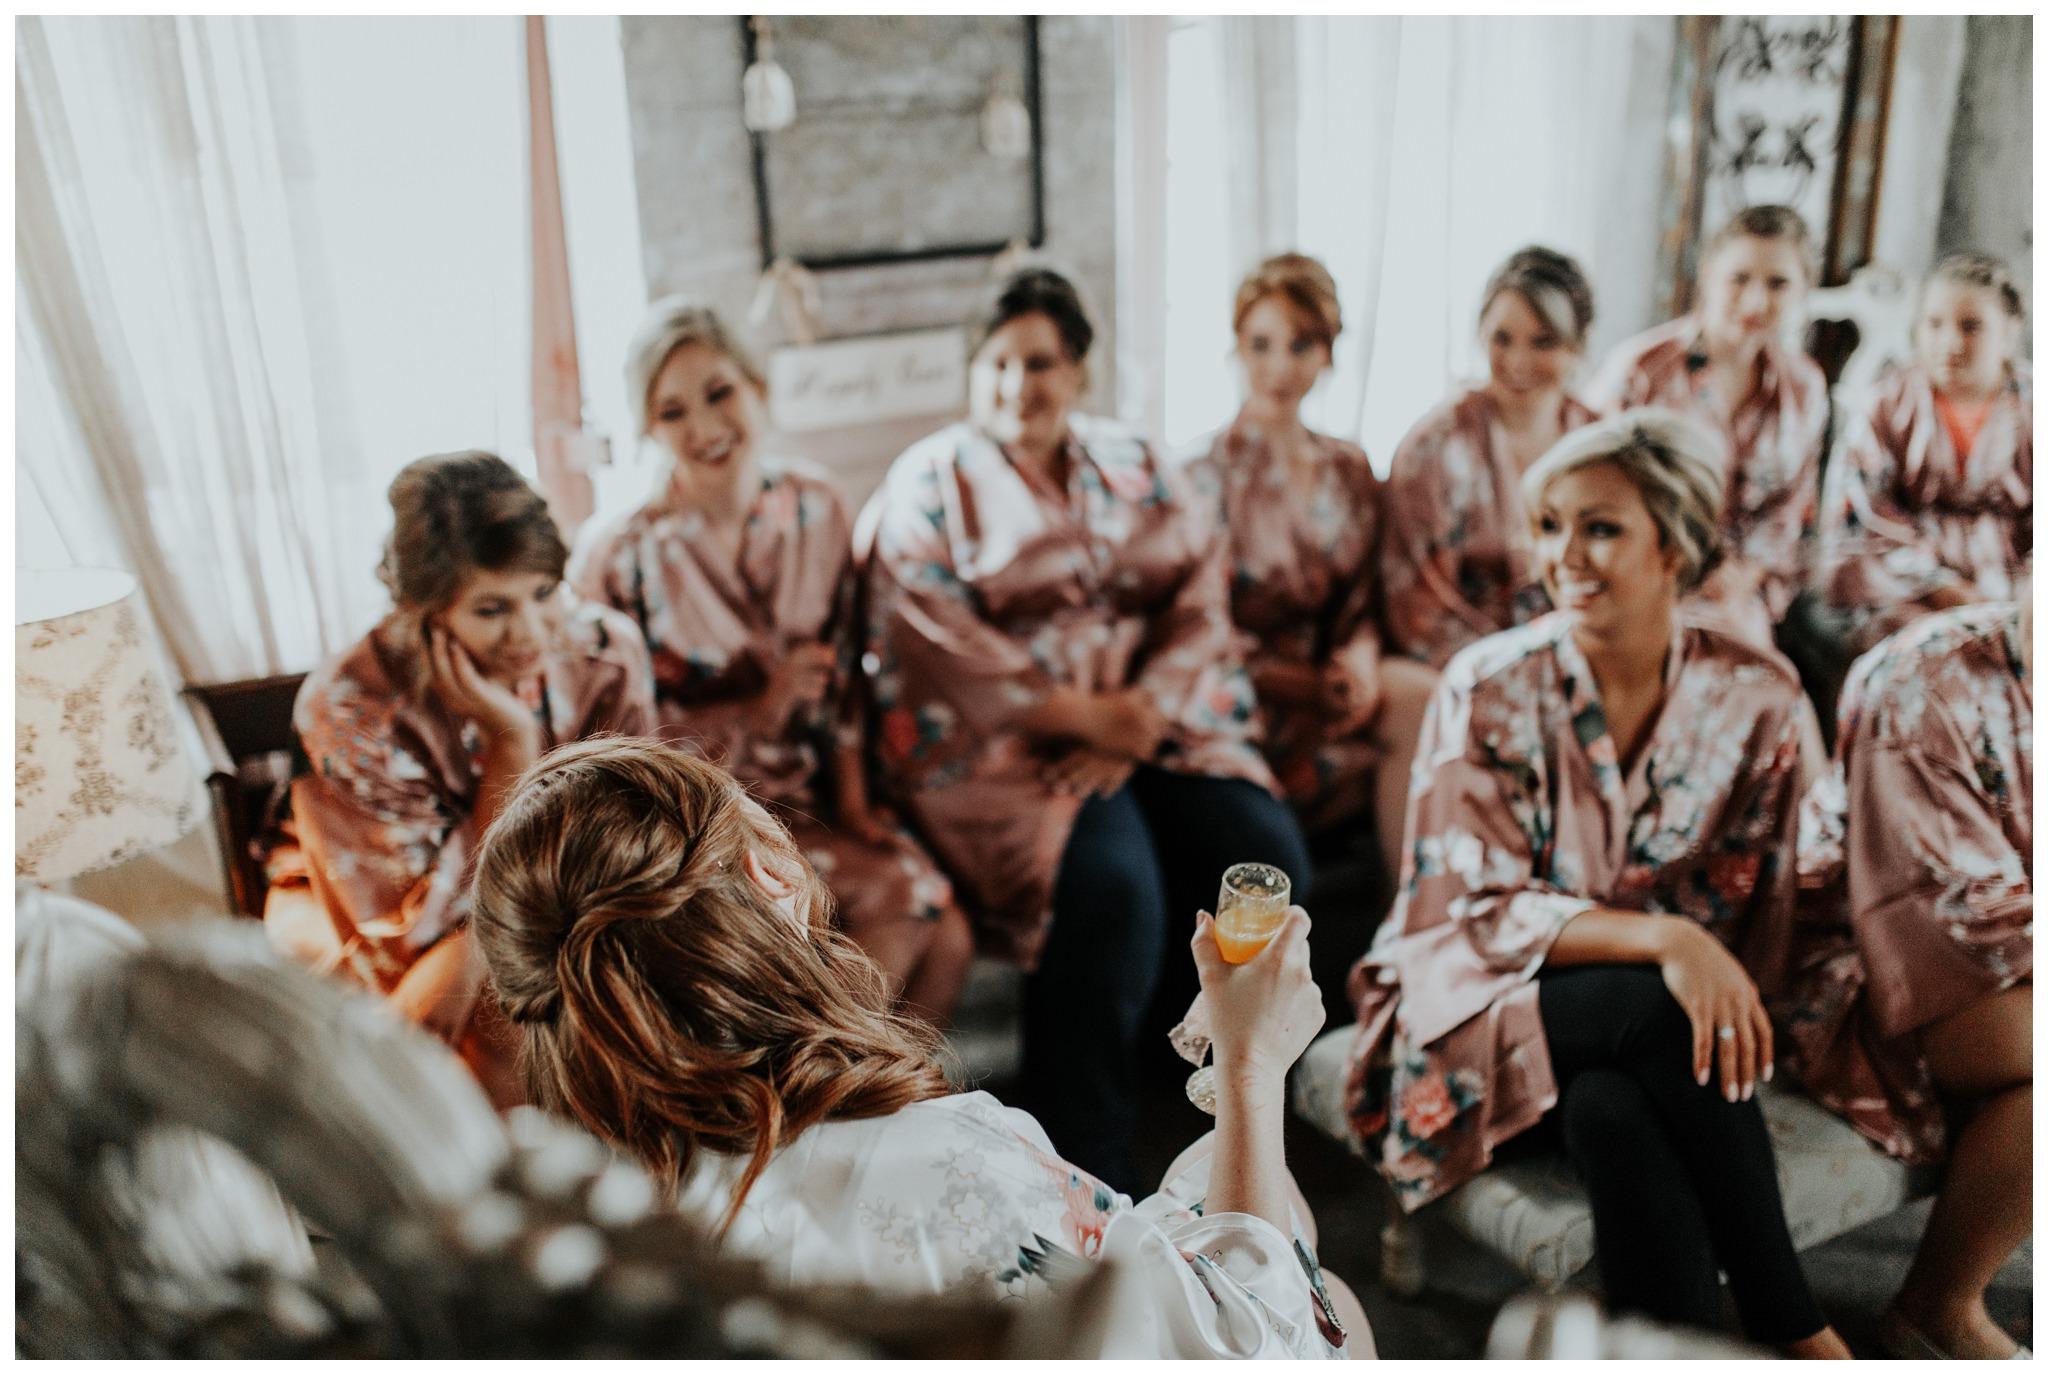 Summertime Olde Dobbin Station - Magnolia Wedding - The Woodlands Texas Wedding Photographer-2329.jpg